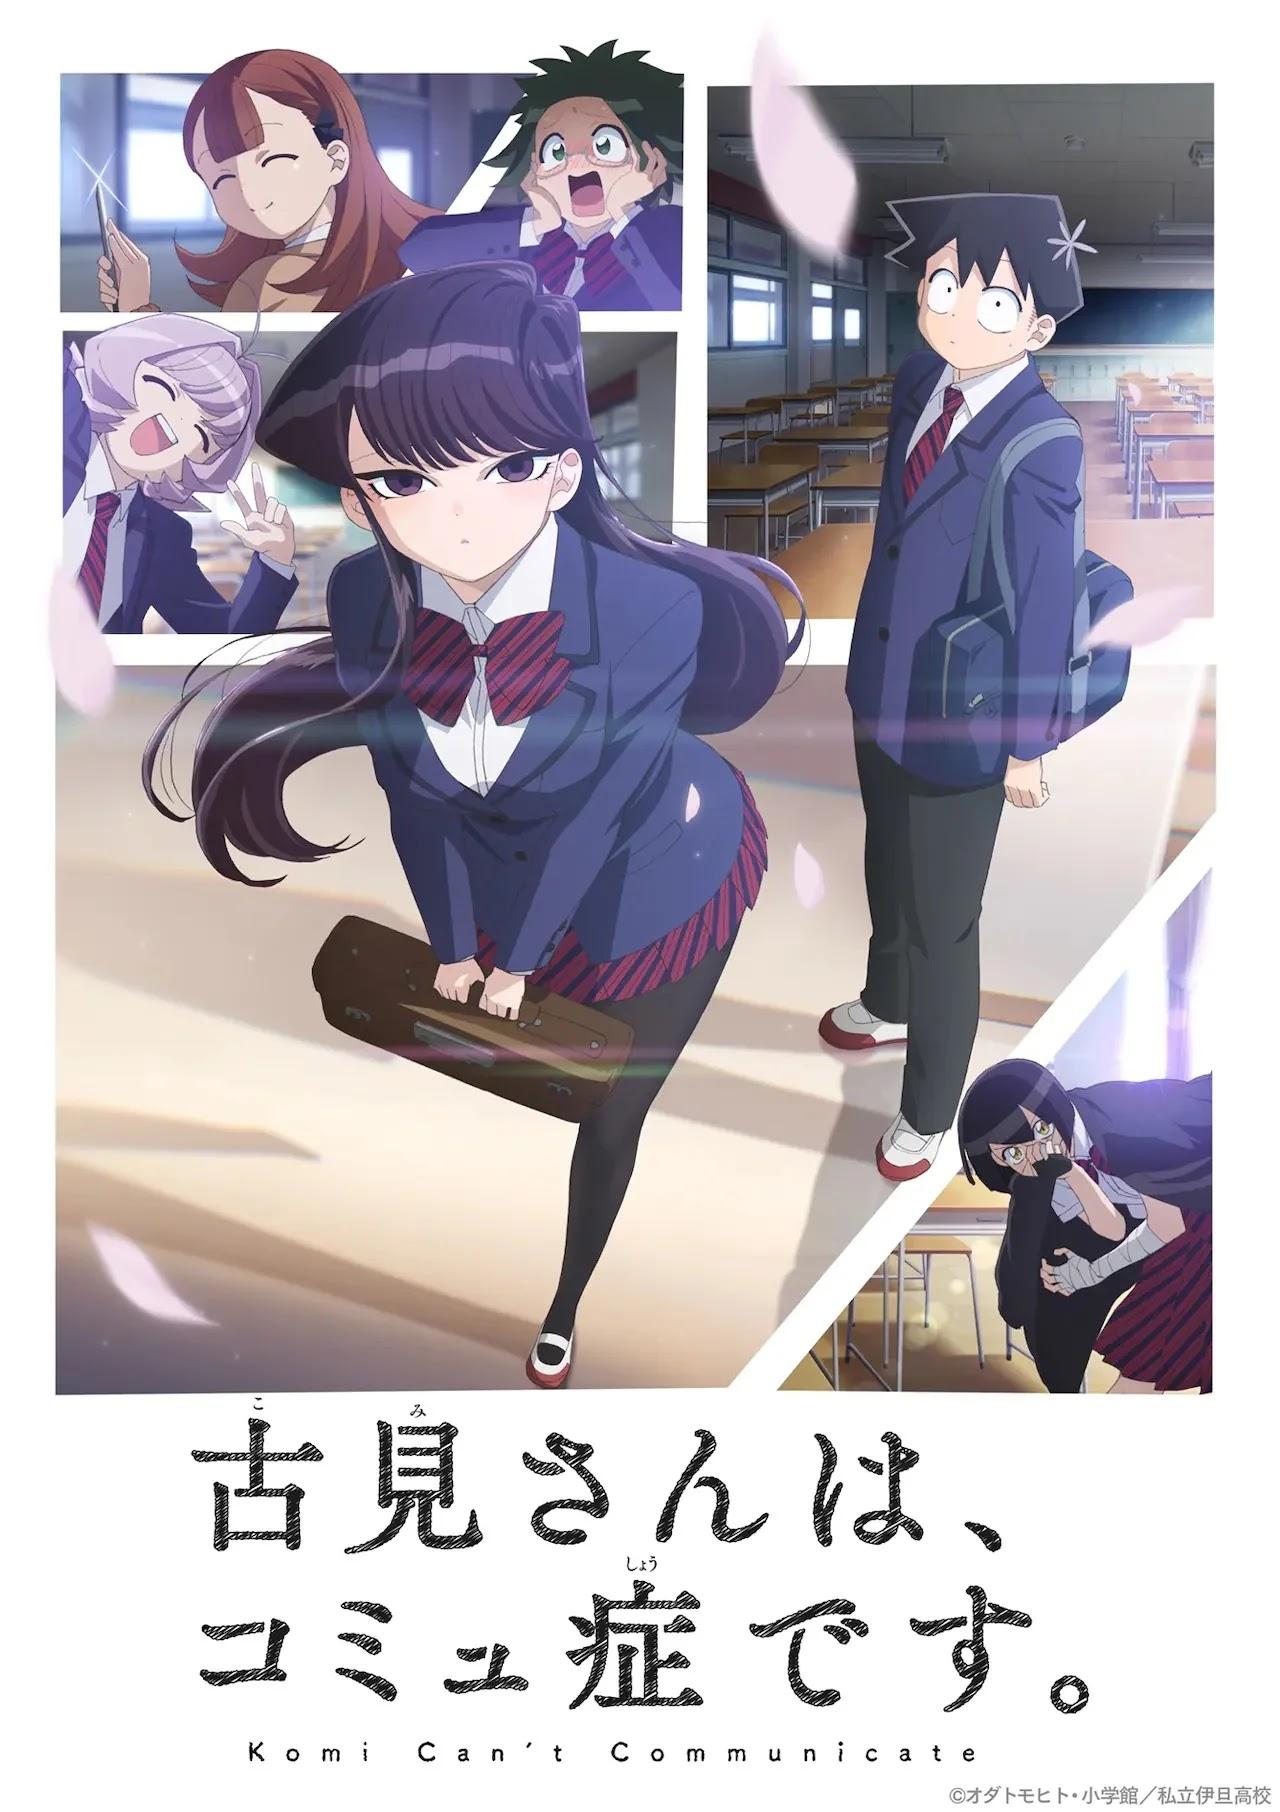 Anime Komi-san wa Comyushou desu revela novo vídeo promocional